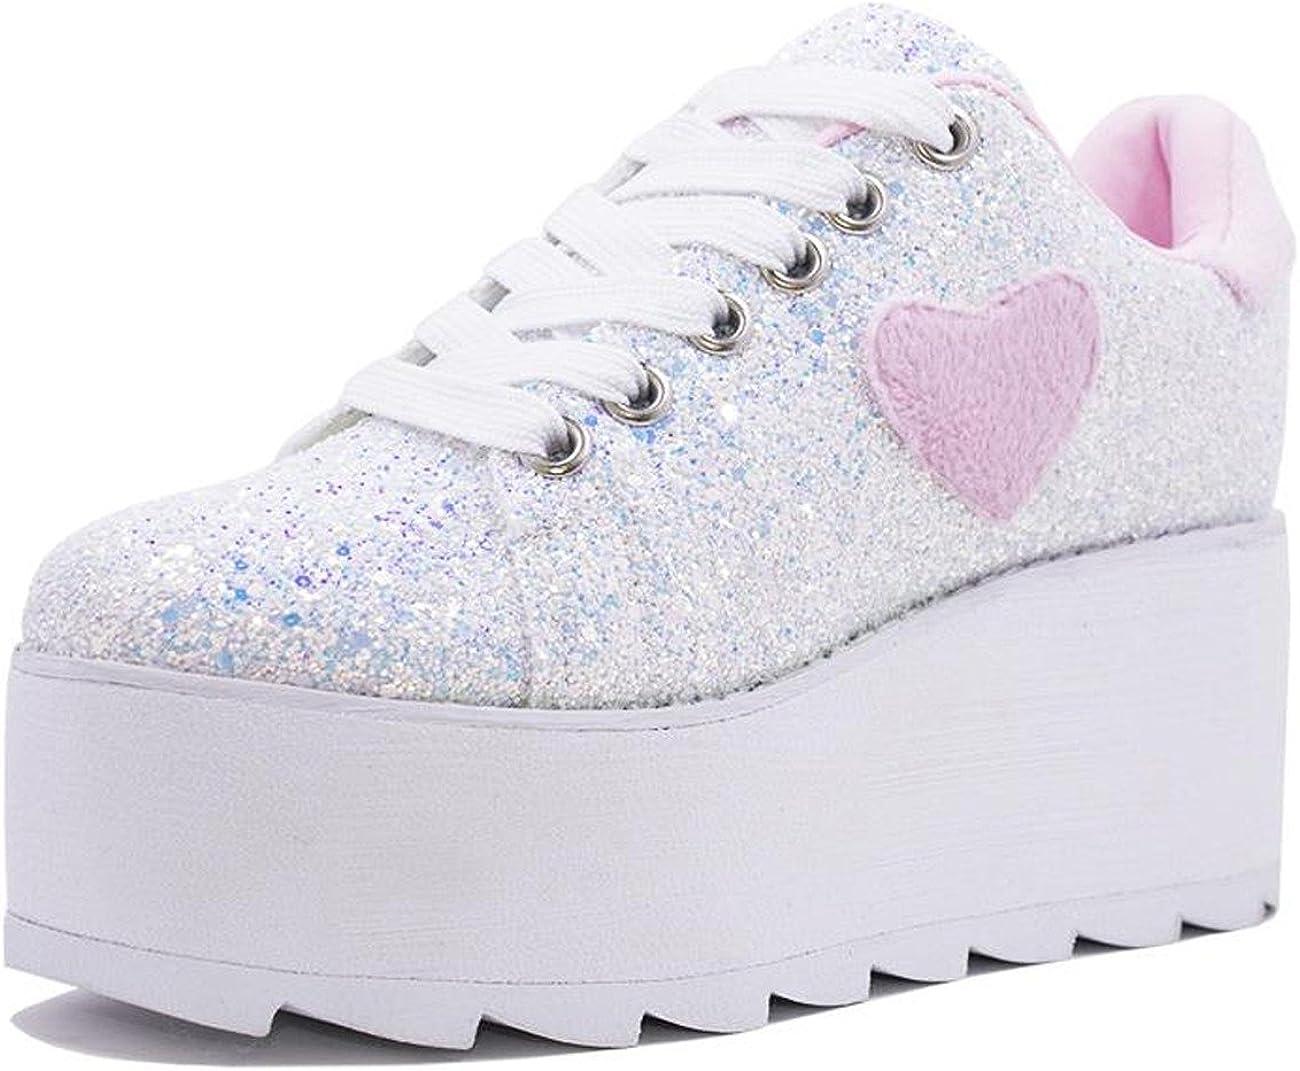 YRU 'Lala Heart', Pink, Glitter